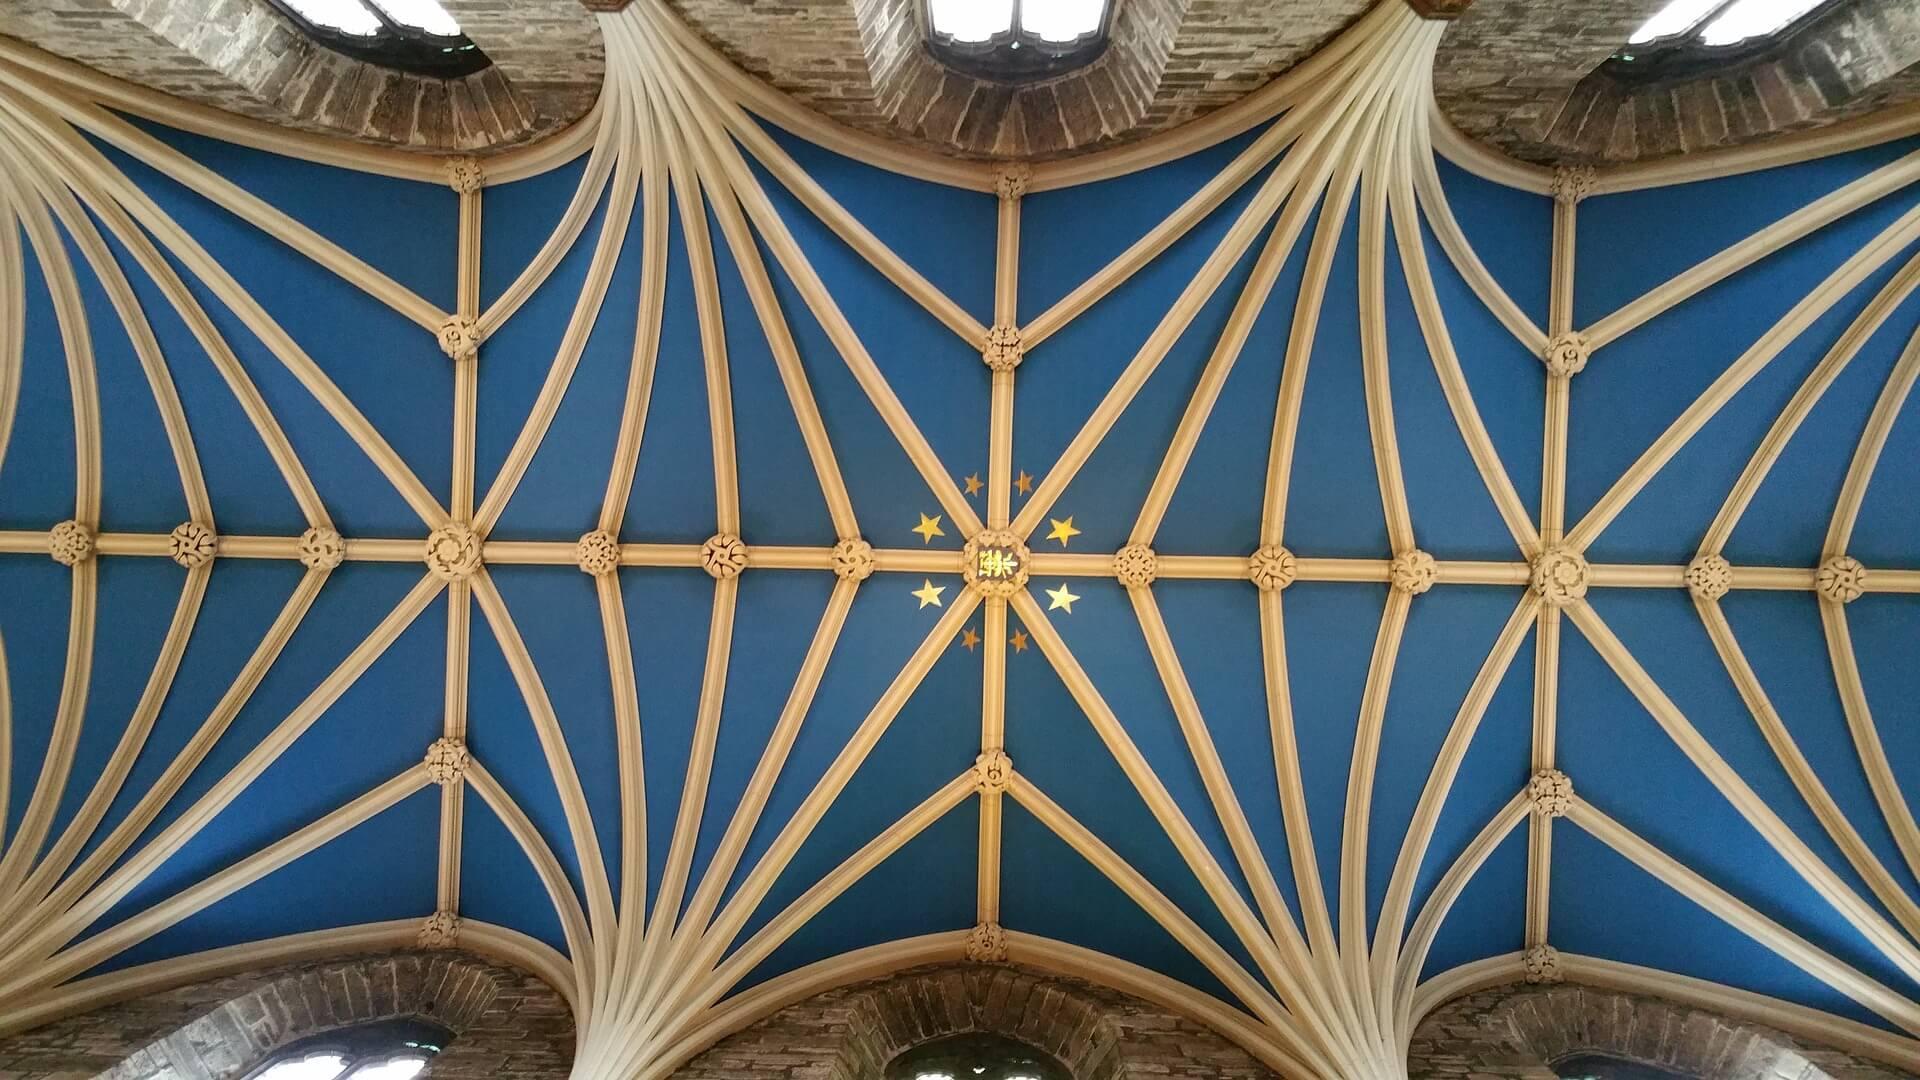 qué ver en Edimburgo - Catedral de St. Giles